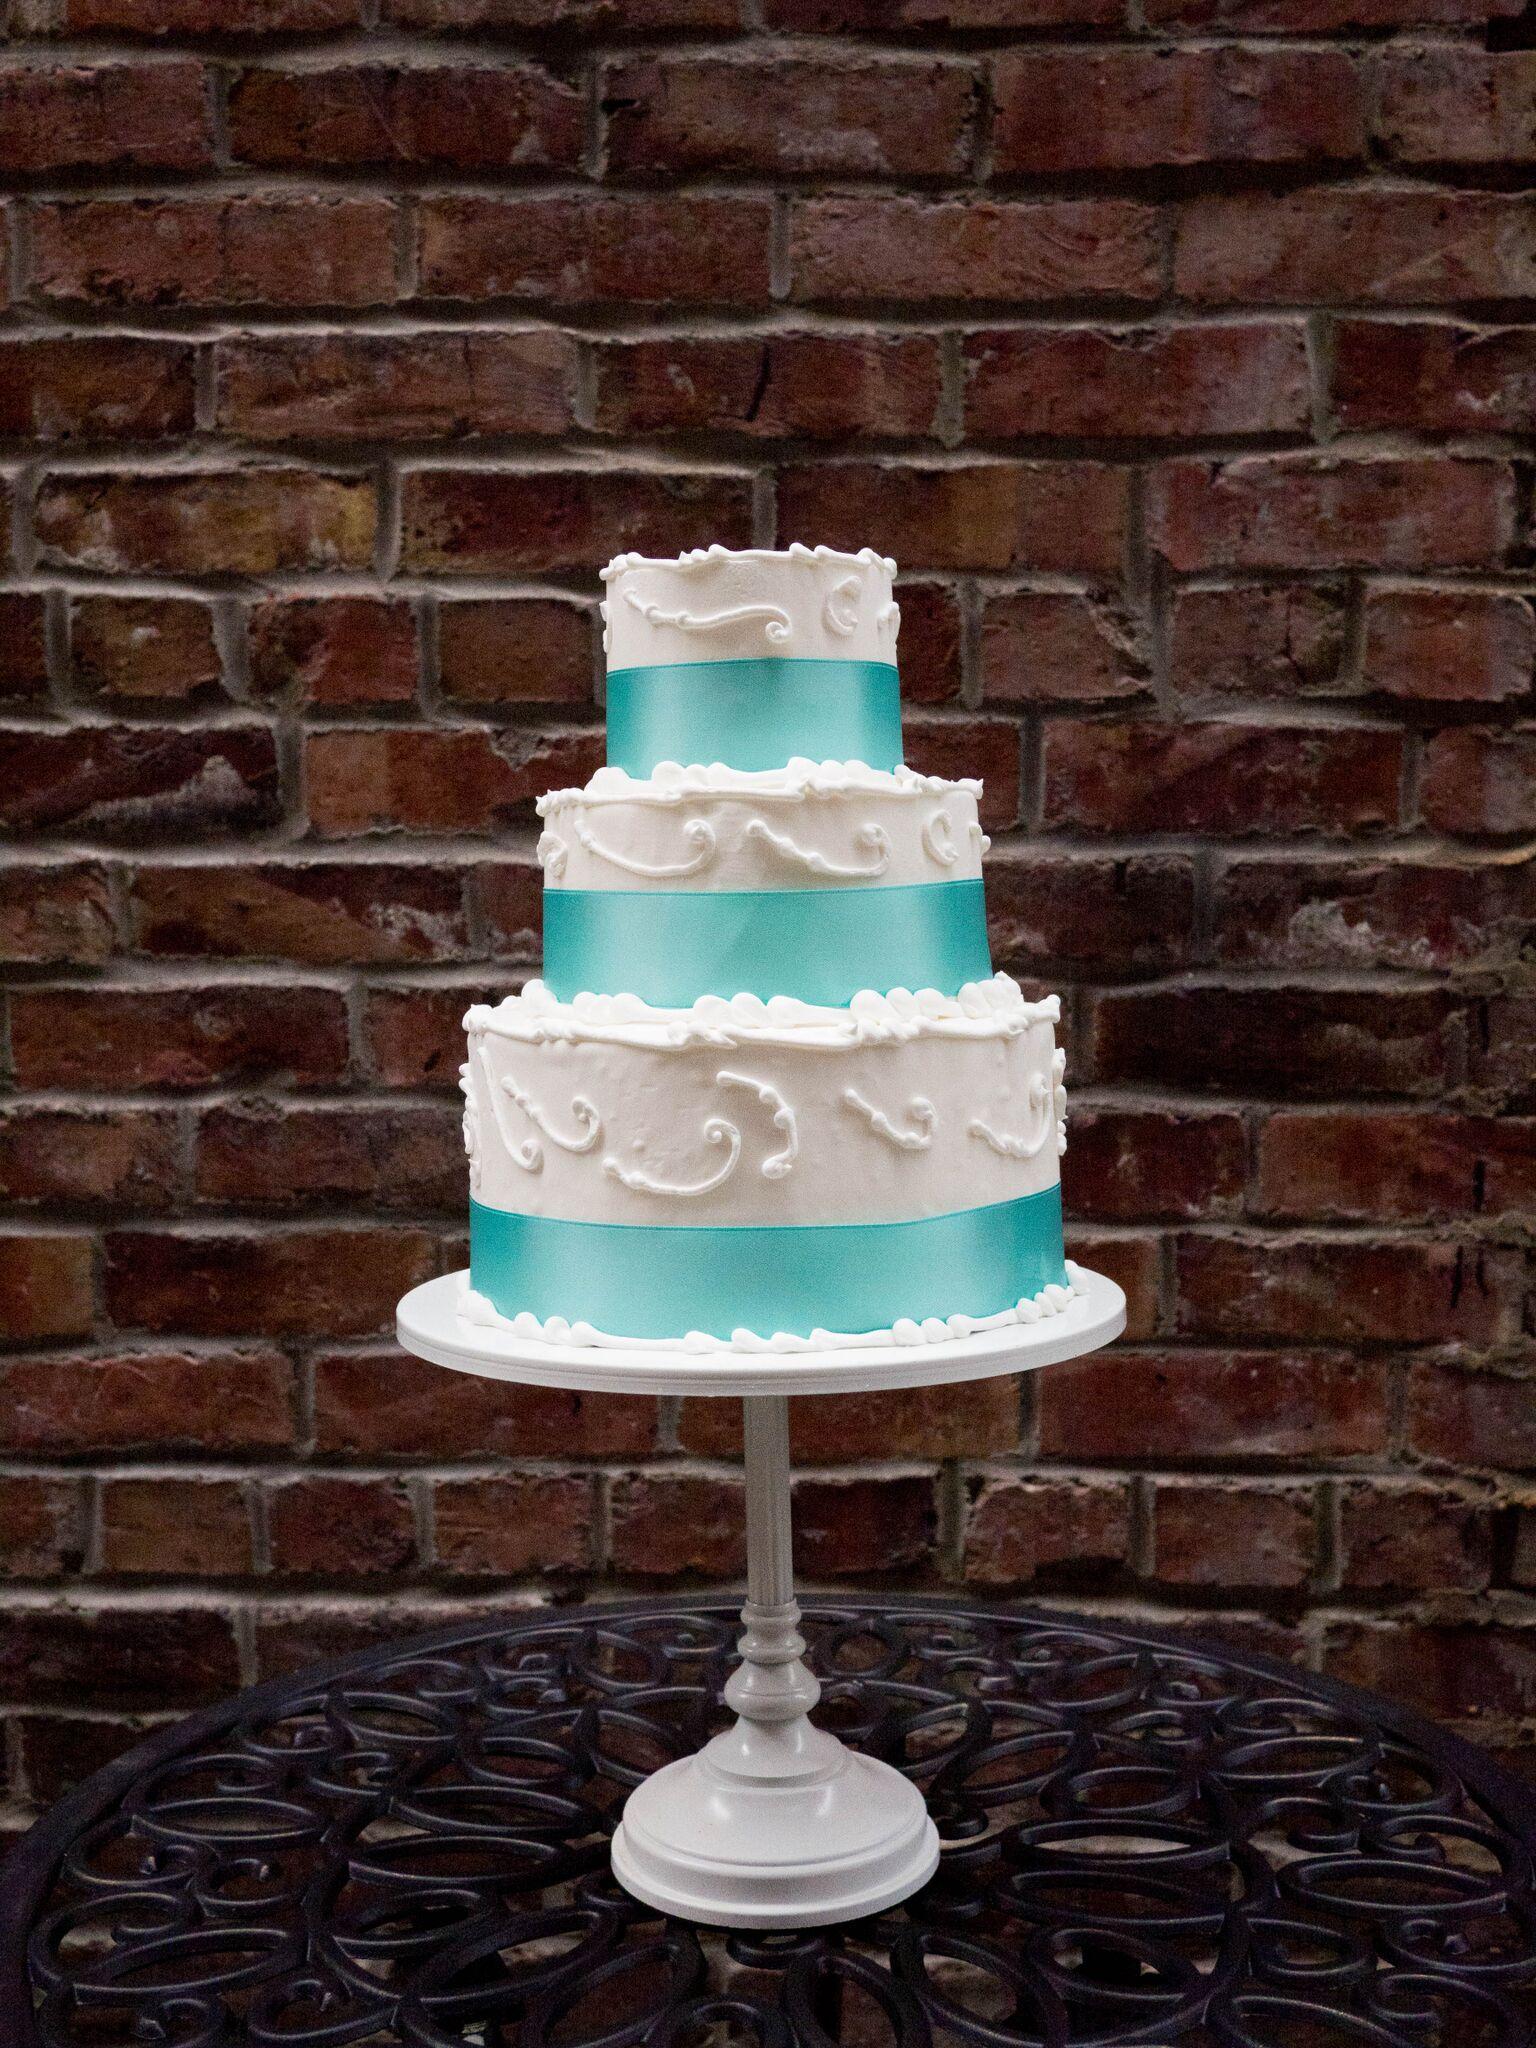 Wedding Cake Pic for Web 12.9.17.jpeg